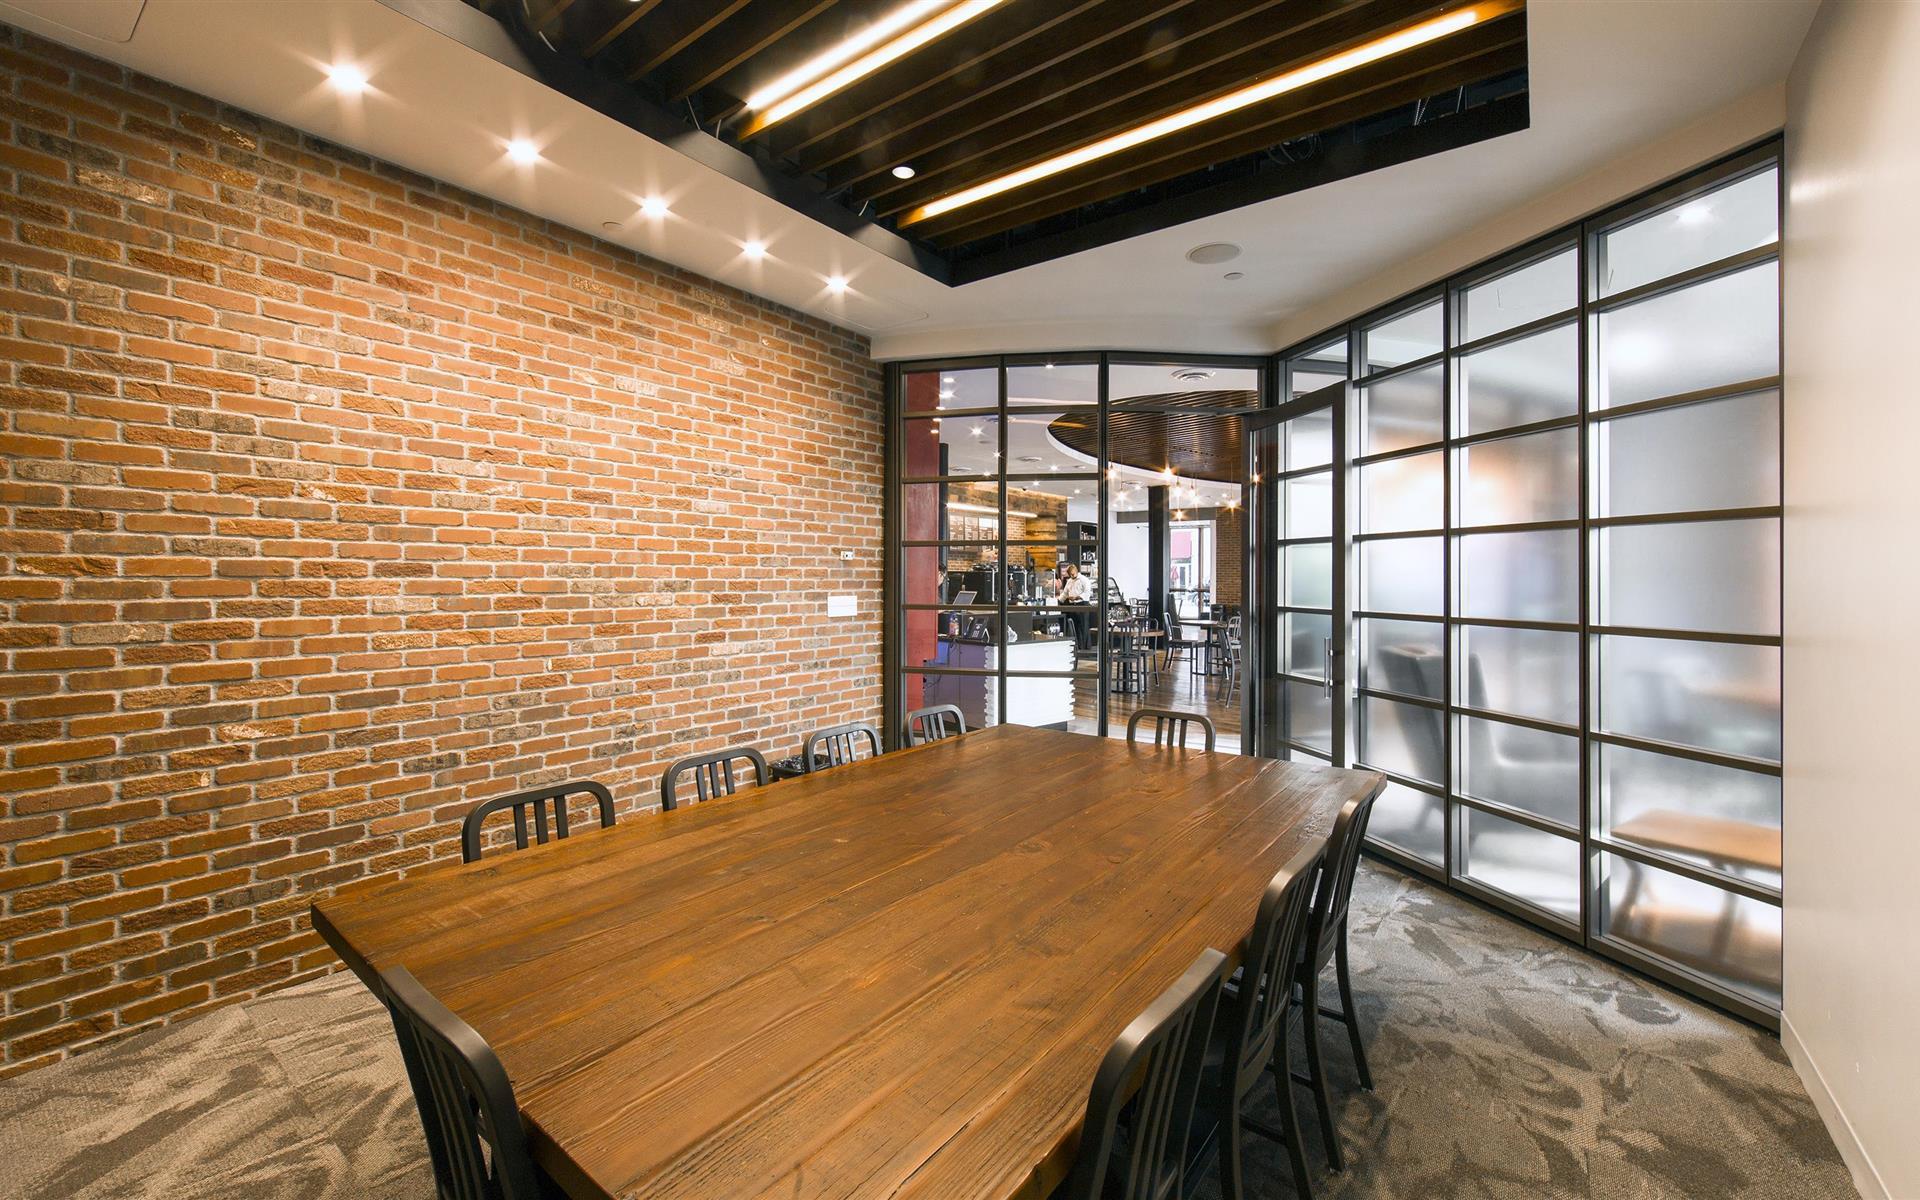 Capital One Café - Back Bay - The Capital One Community Room